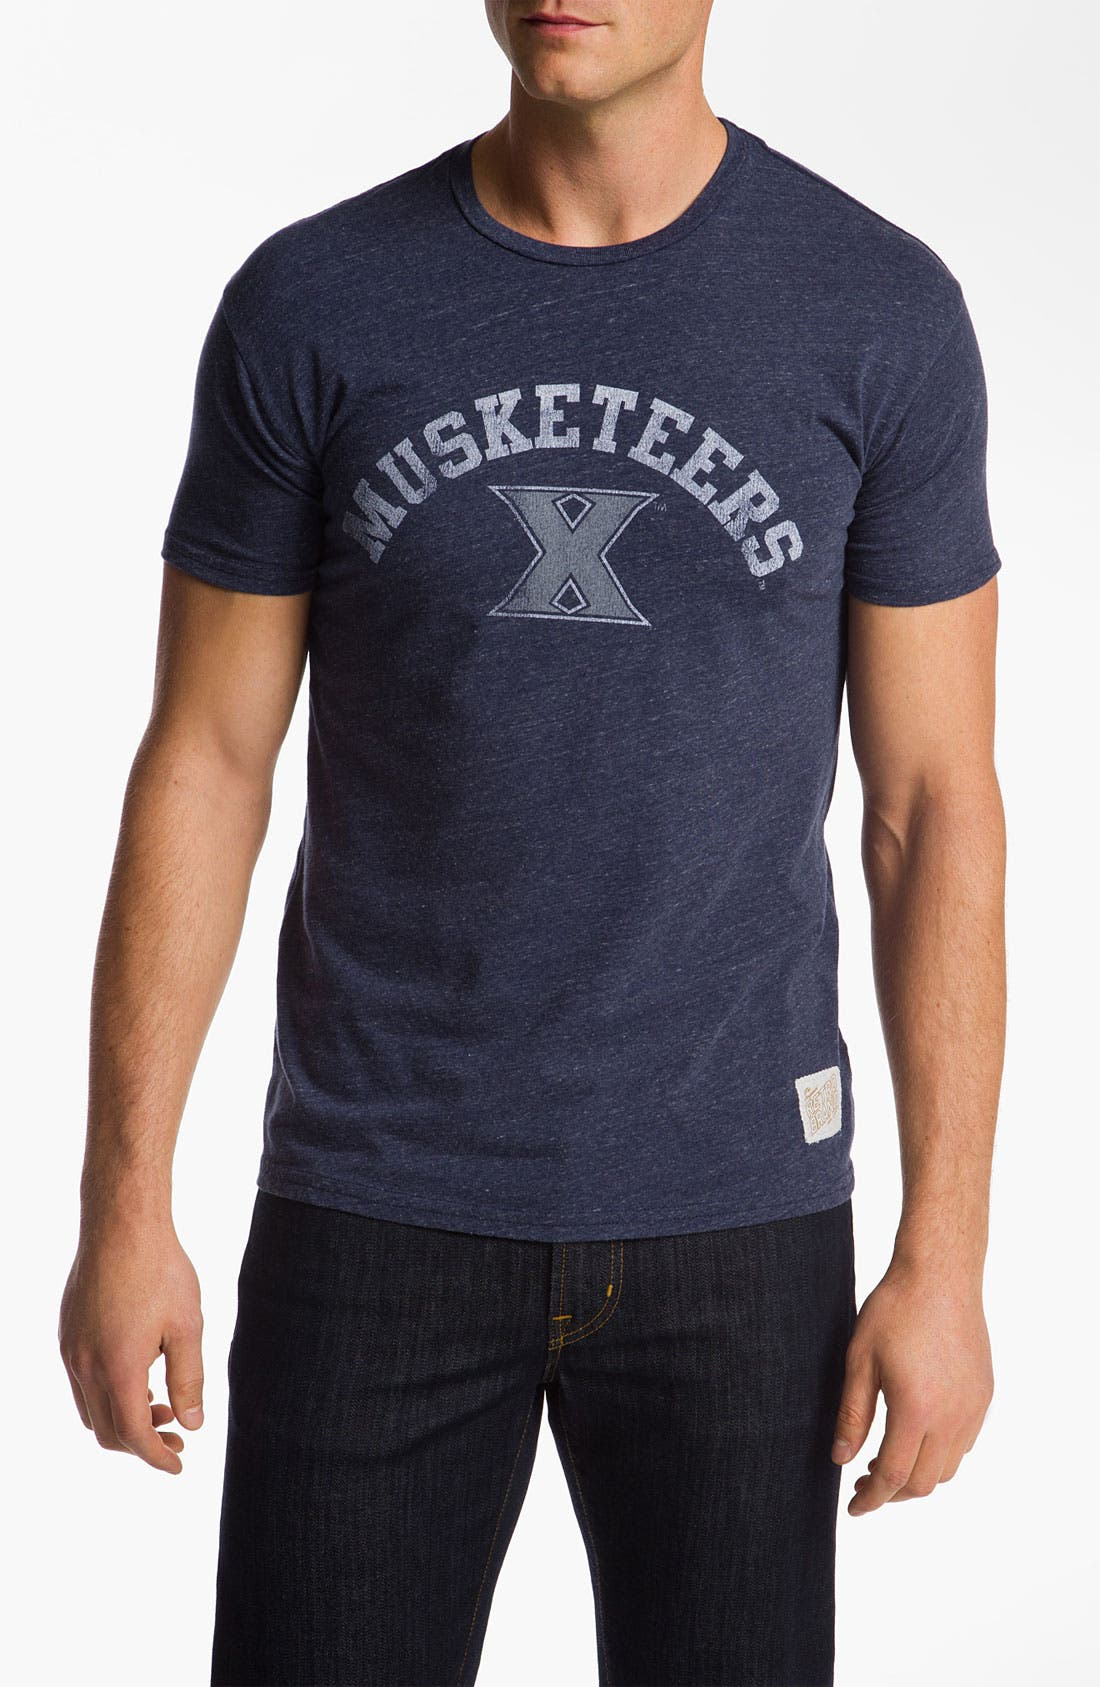 Alternate Image 1 Selected - The Original Retro Brand 'Xavier Musketeers - Stitch' T-Shirt